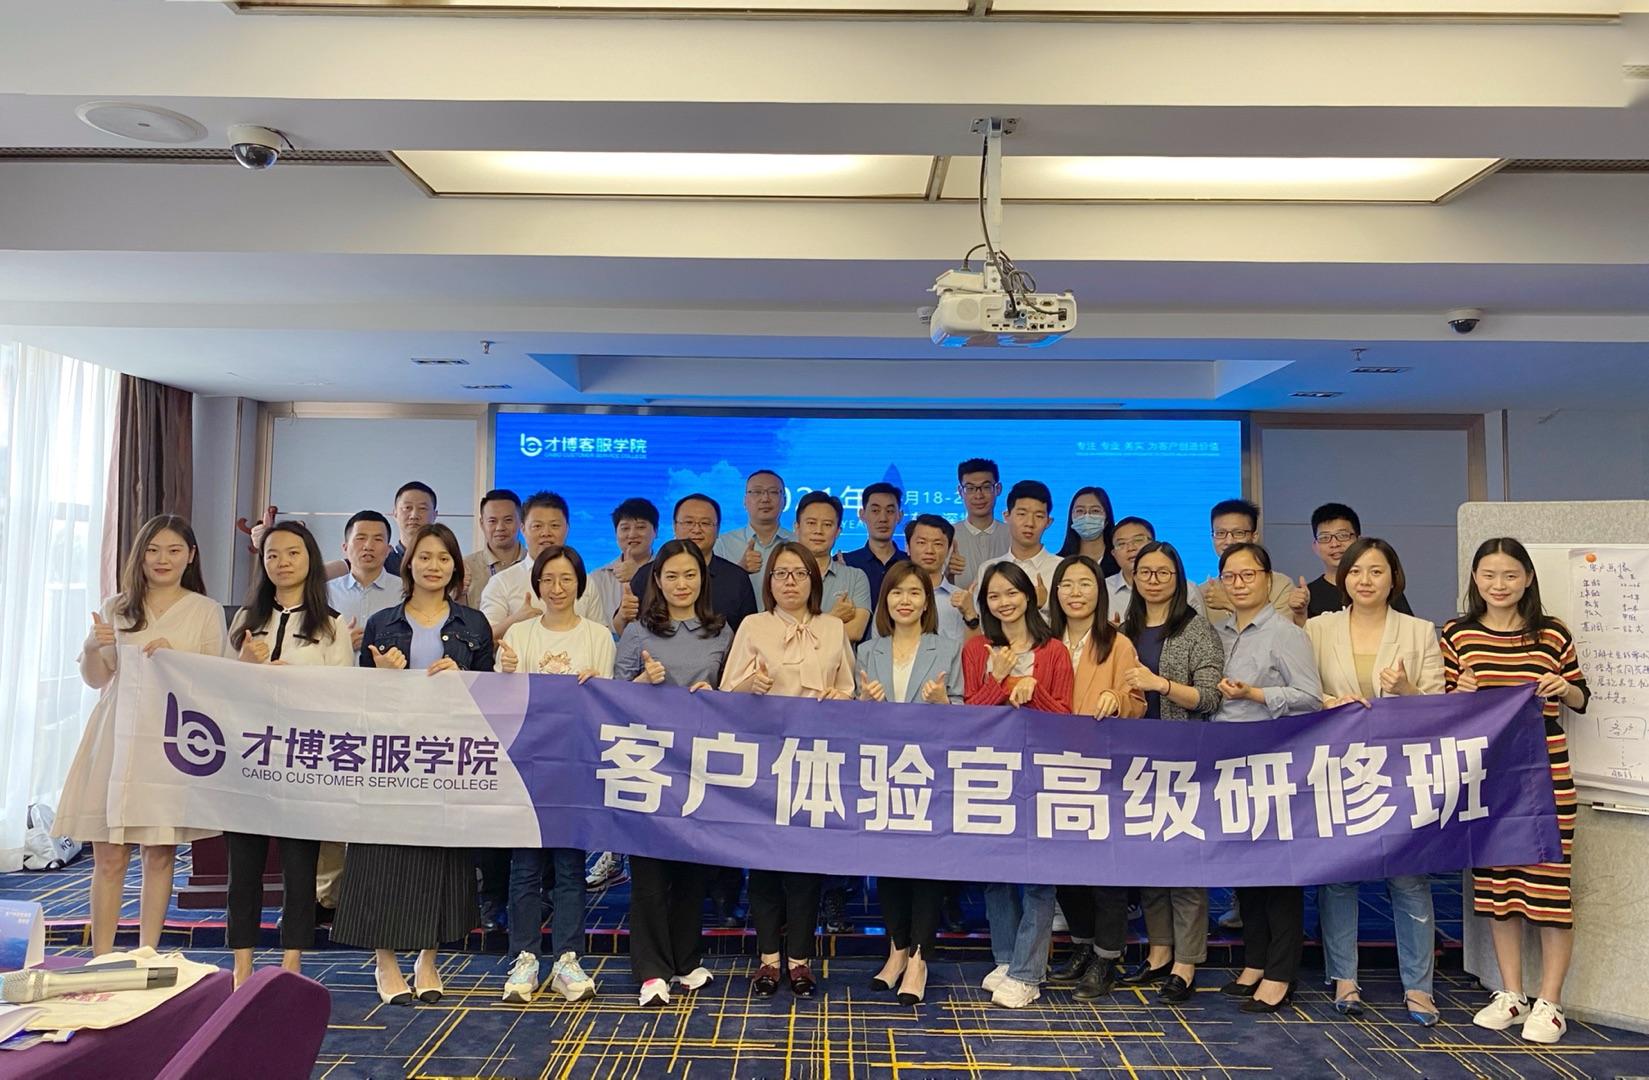 <b>【课程新闻】2021(第六期)客户体验官高级研修班</b>